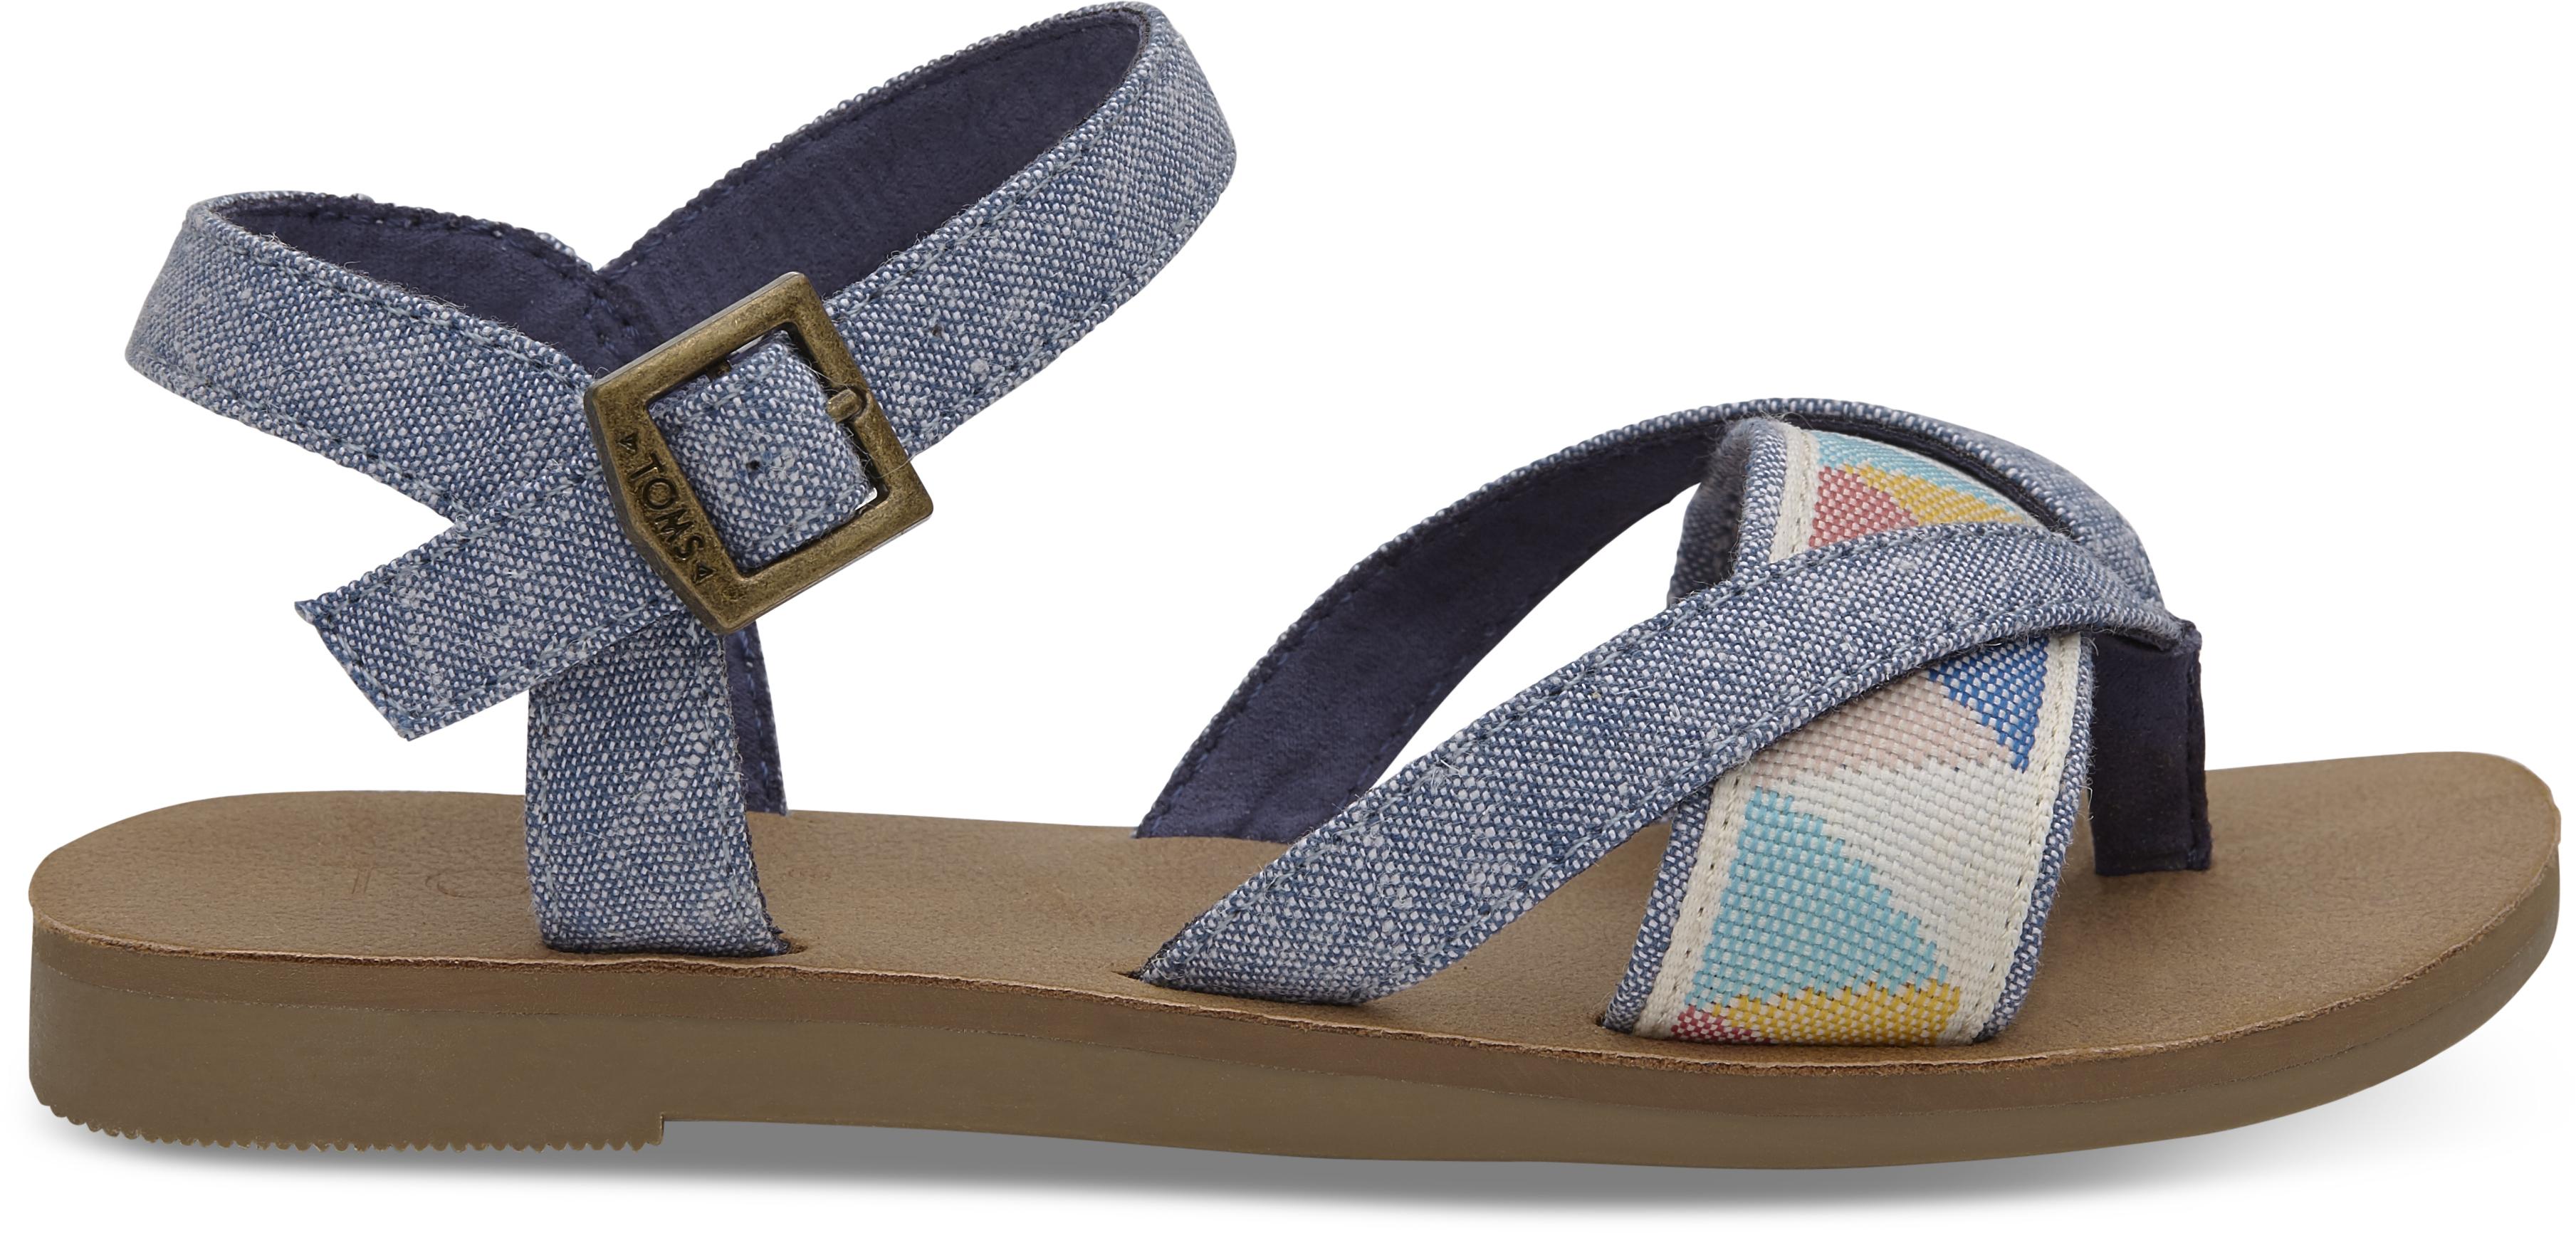 1f0cf2da6f896 Detské modré sandálky TOMS Tribal Lexie - Glami.sk